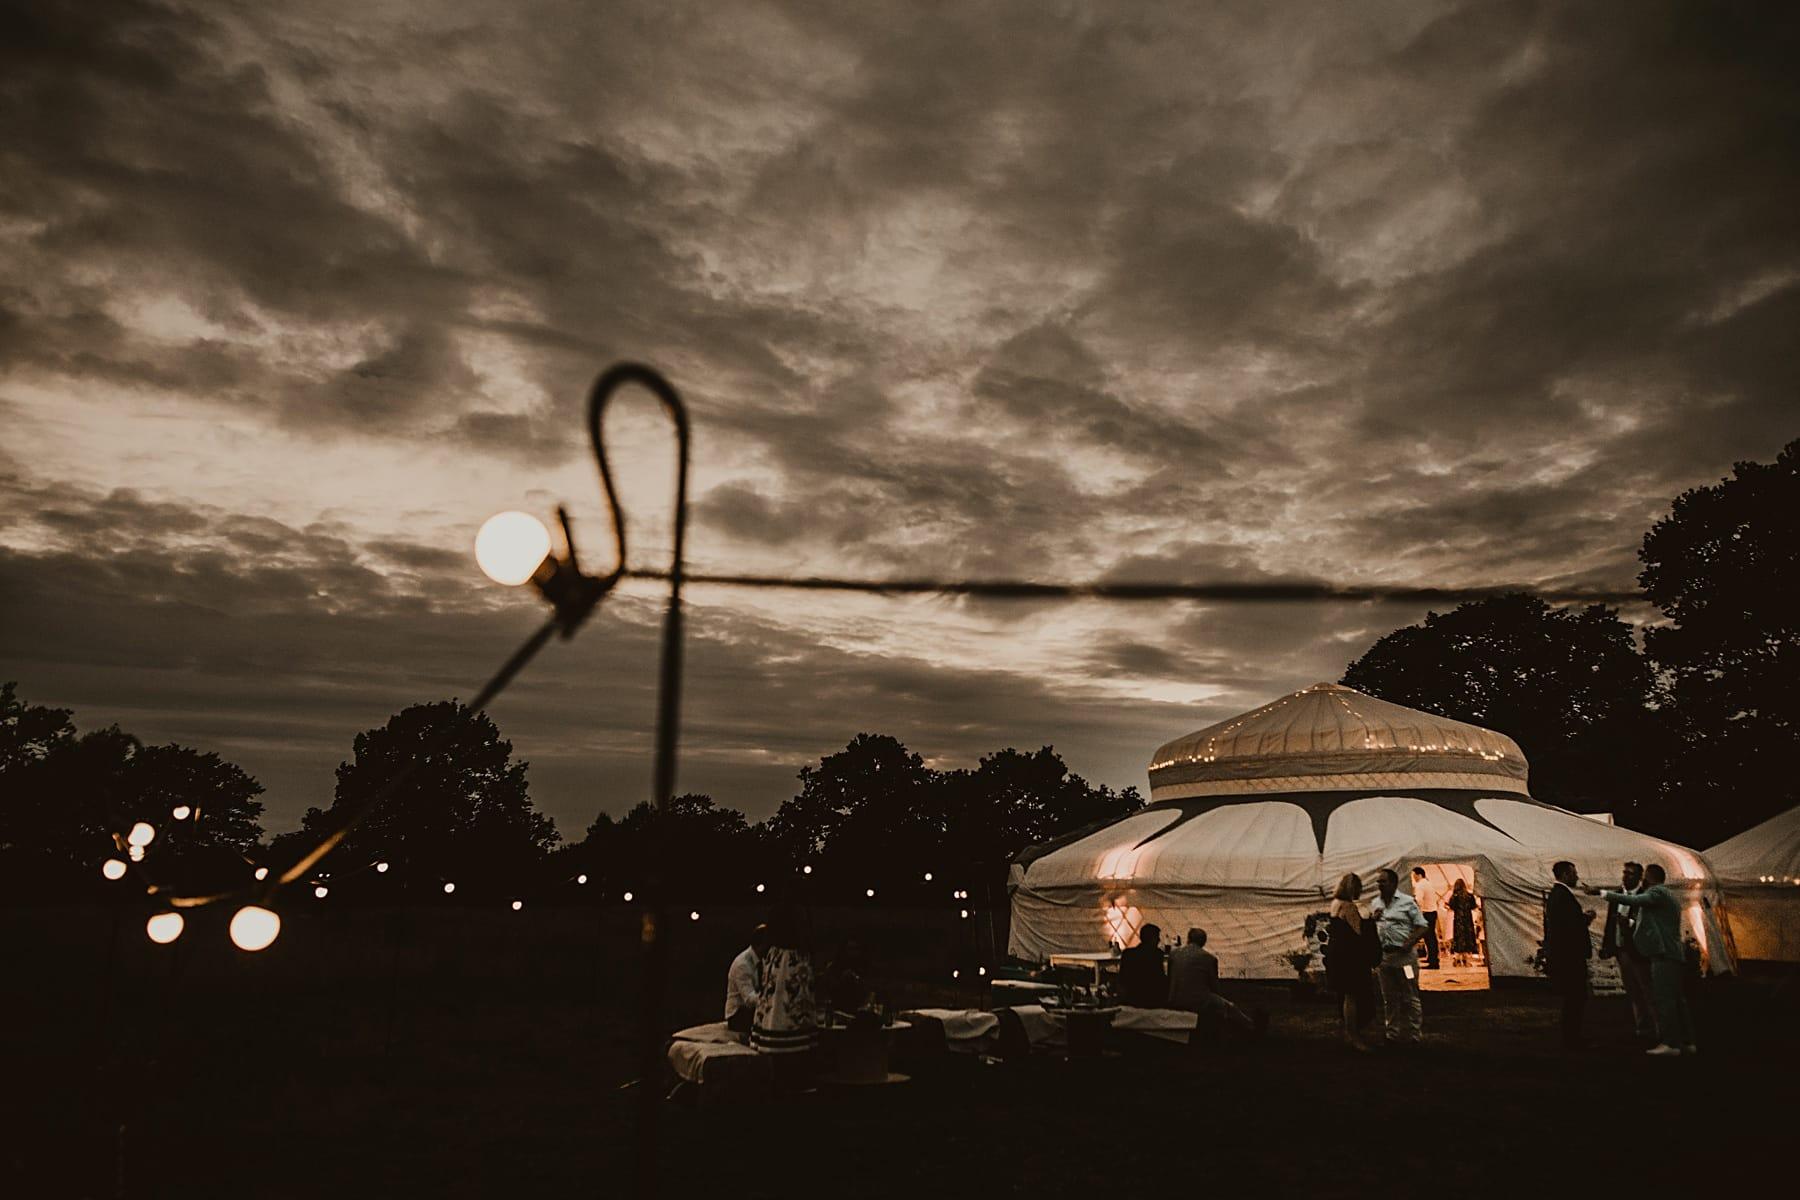 Yurt lit up at night with festoon lights